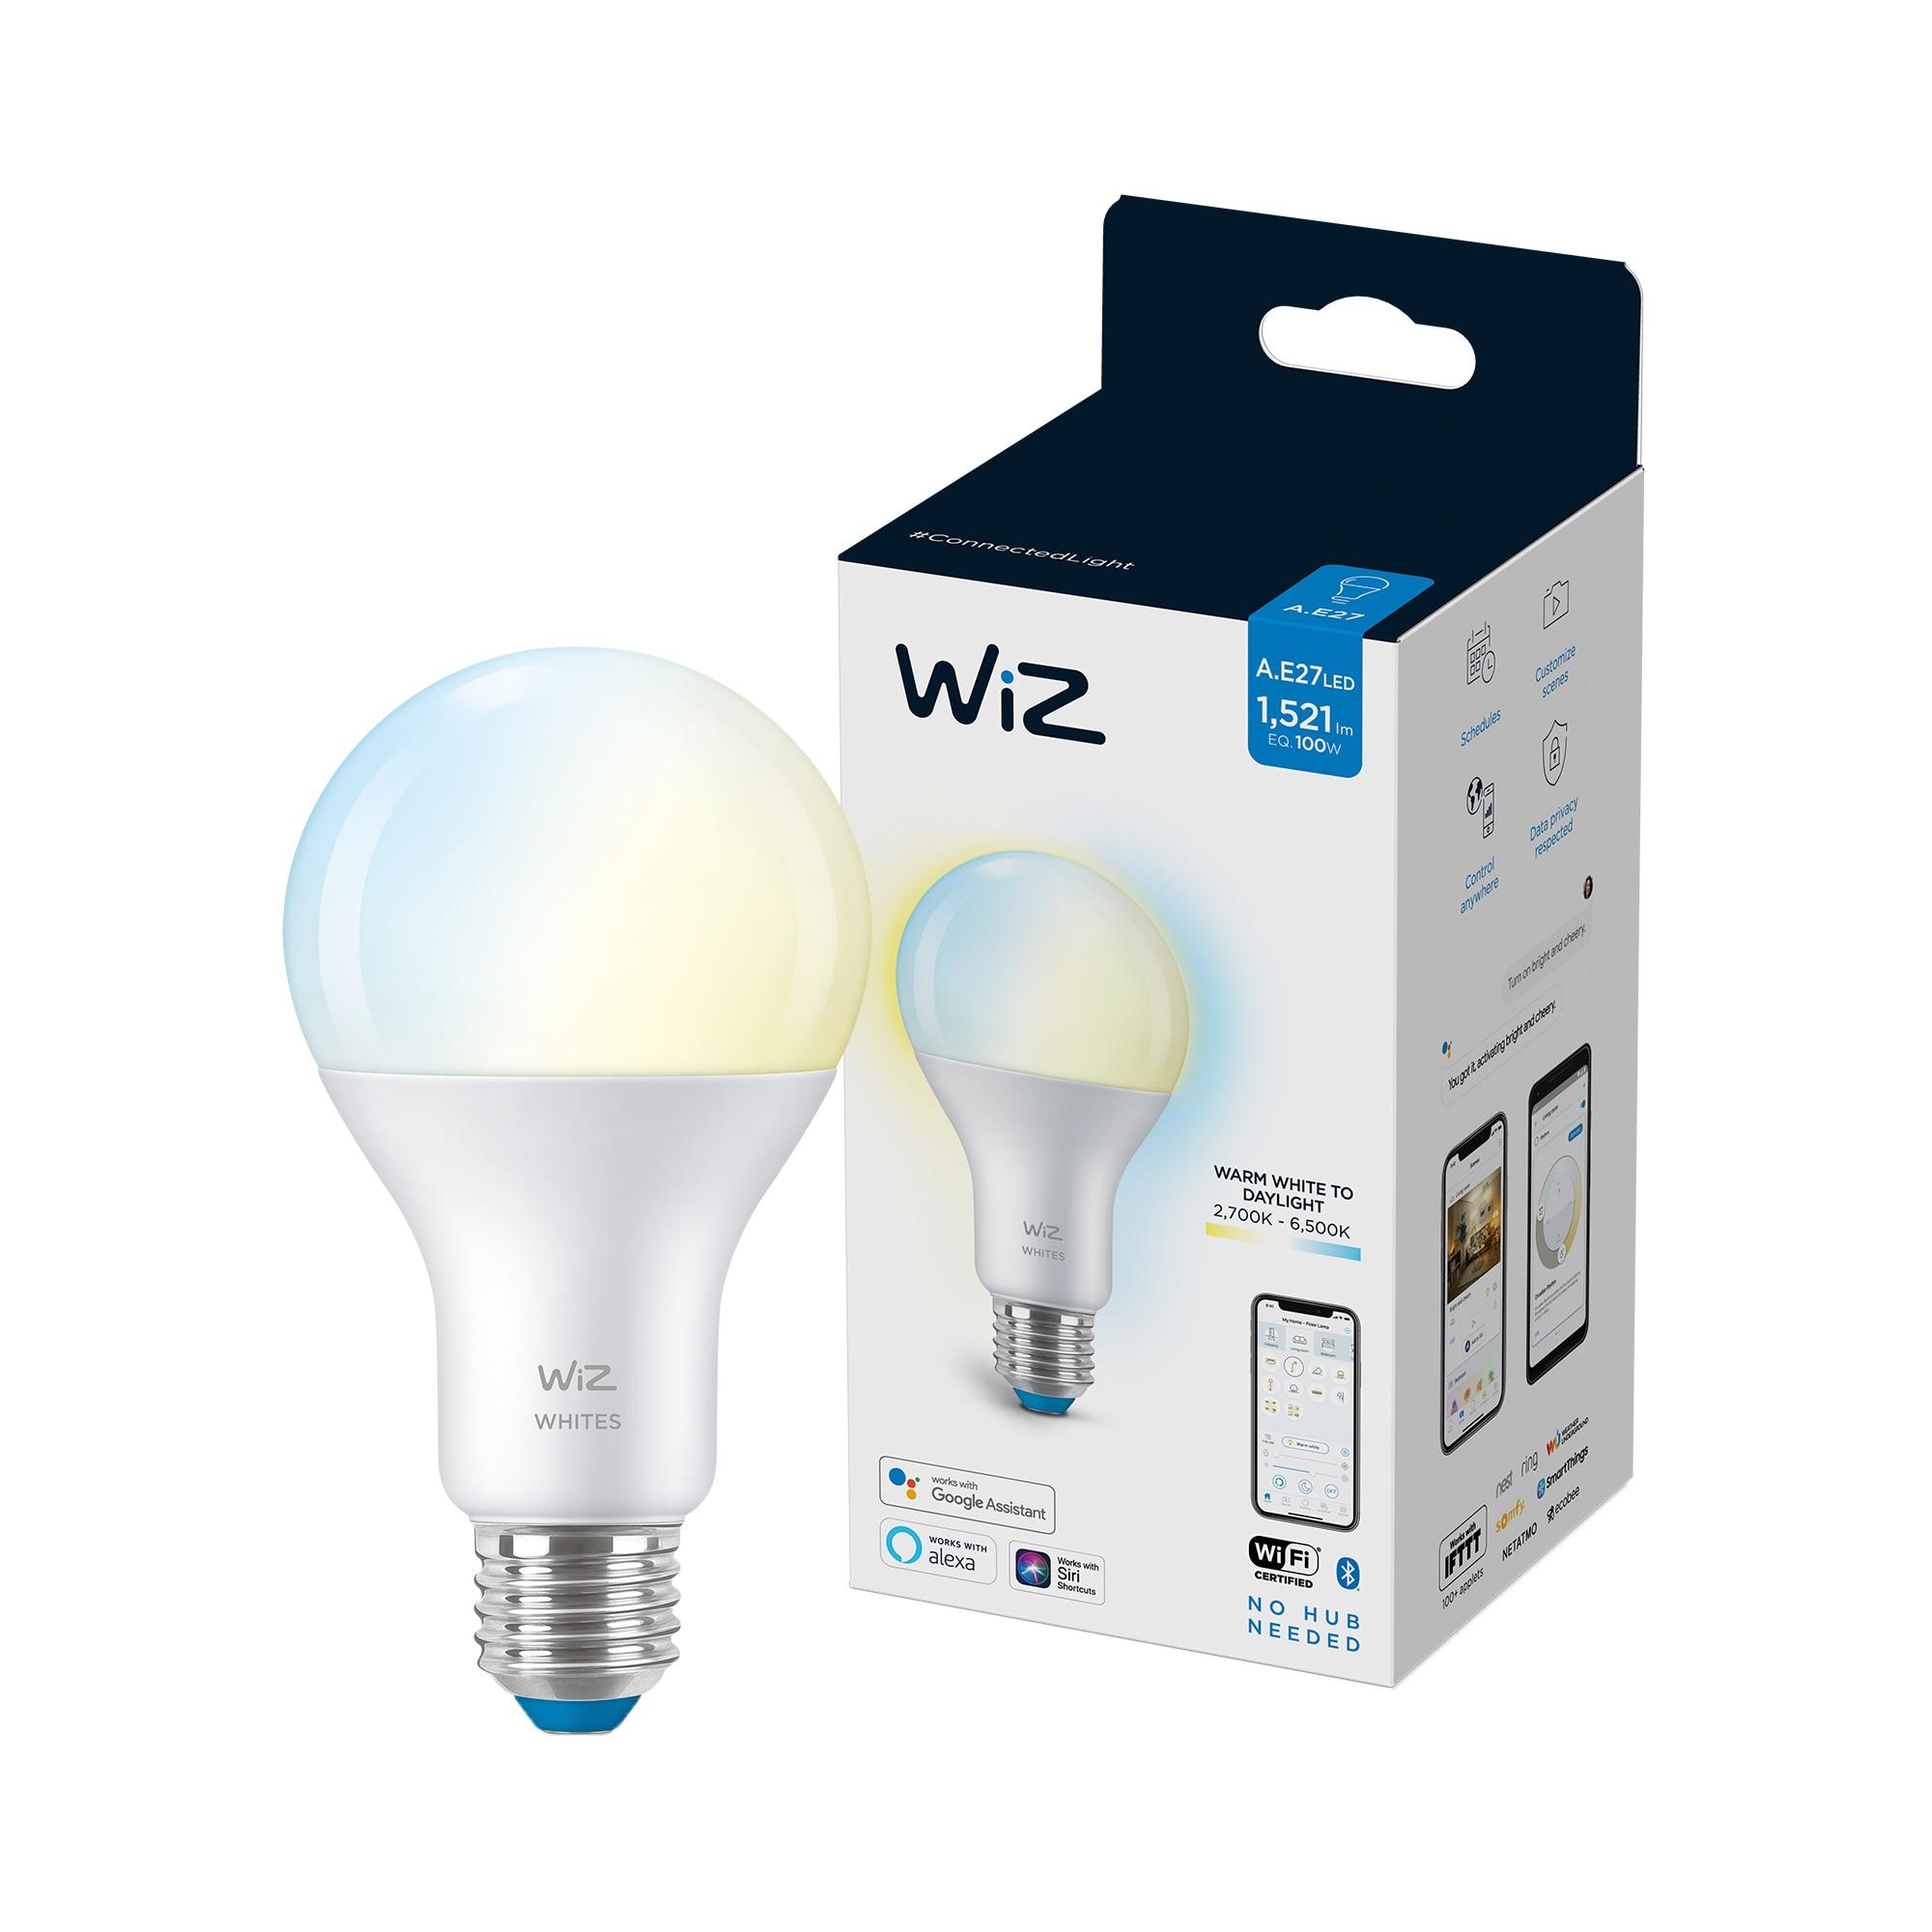 Fotografie Bec LED inteligent WiZ Connected Whites, Wi-Fi, A67, E27, 13W (100W), 1521 lm, temperatura lumina reglabila (2700K-6500K), compatibil Google Assistant/Alexa/Siri